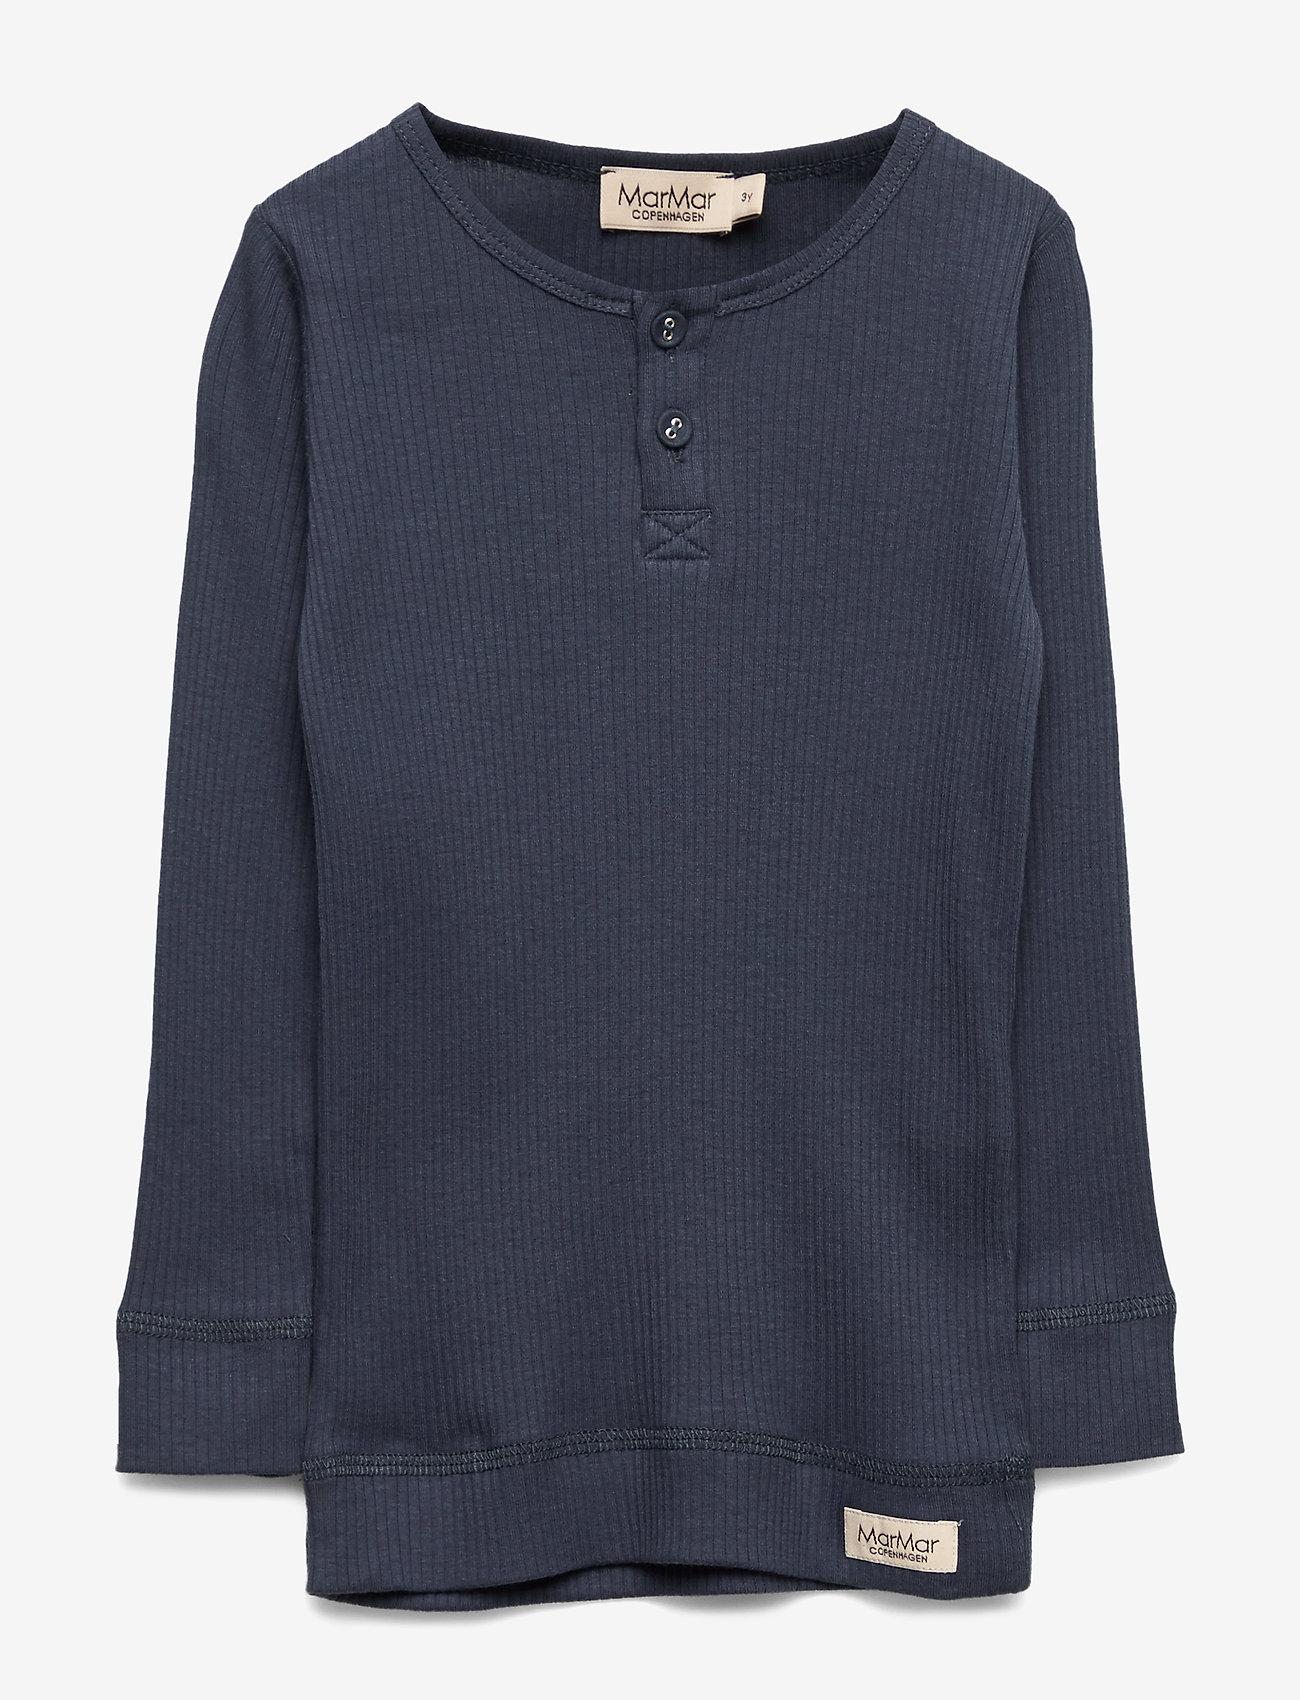 MarMar Cph - Tee LS - pitkähihaiset paidat - blue - 0